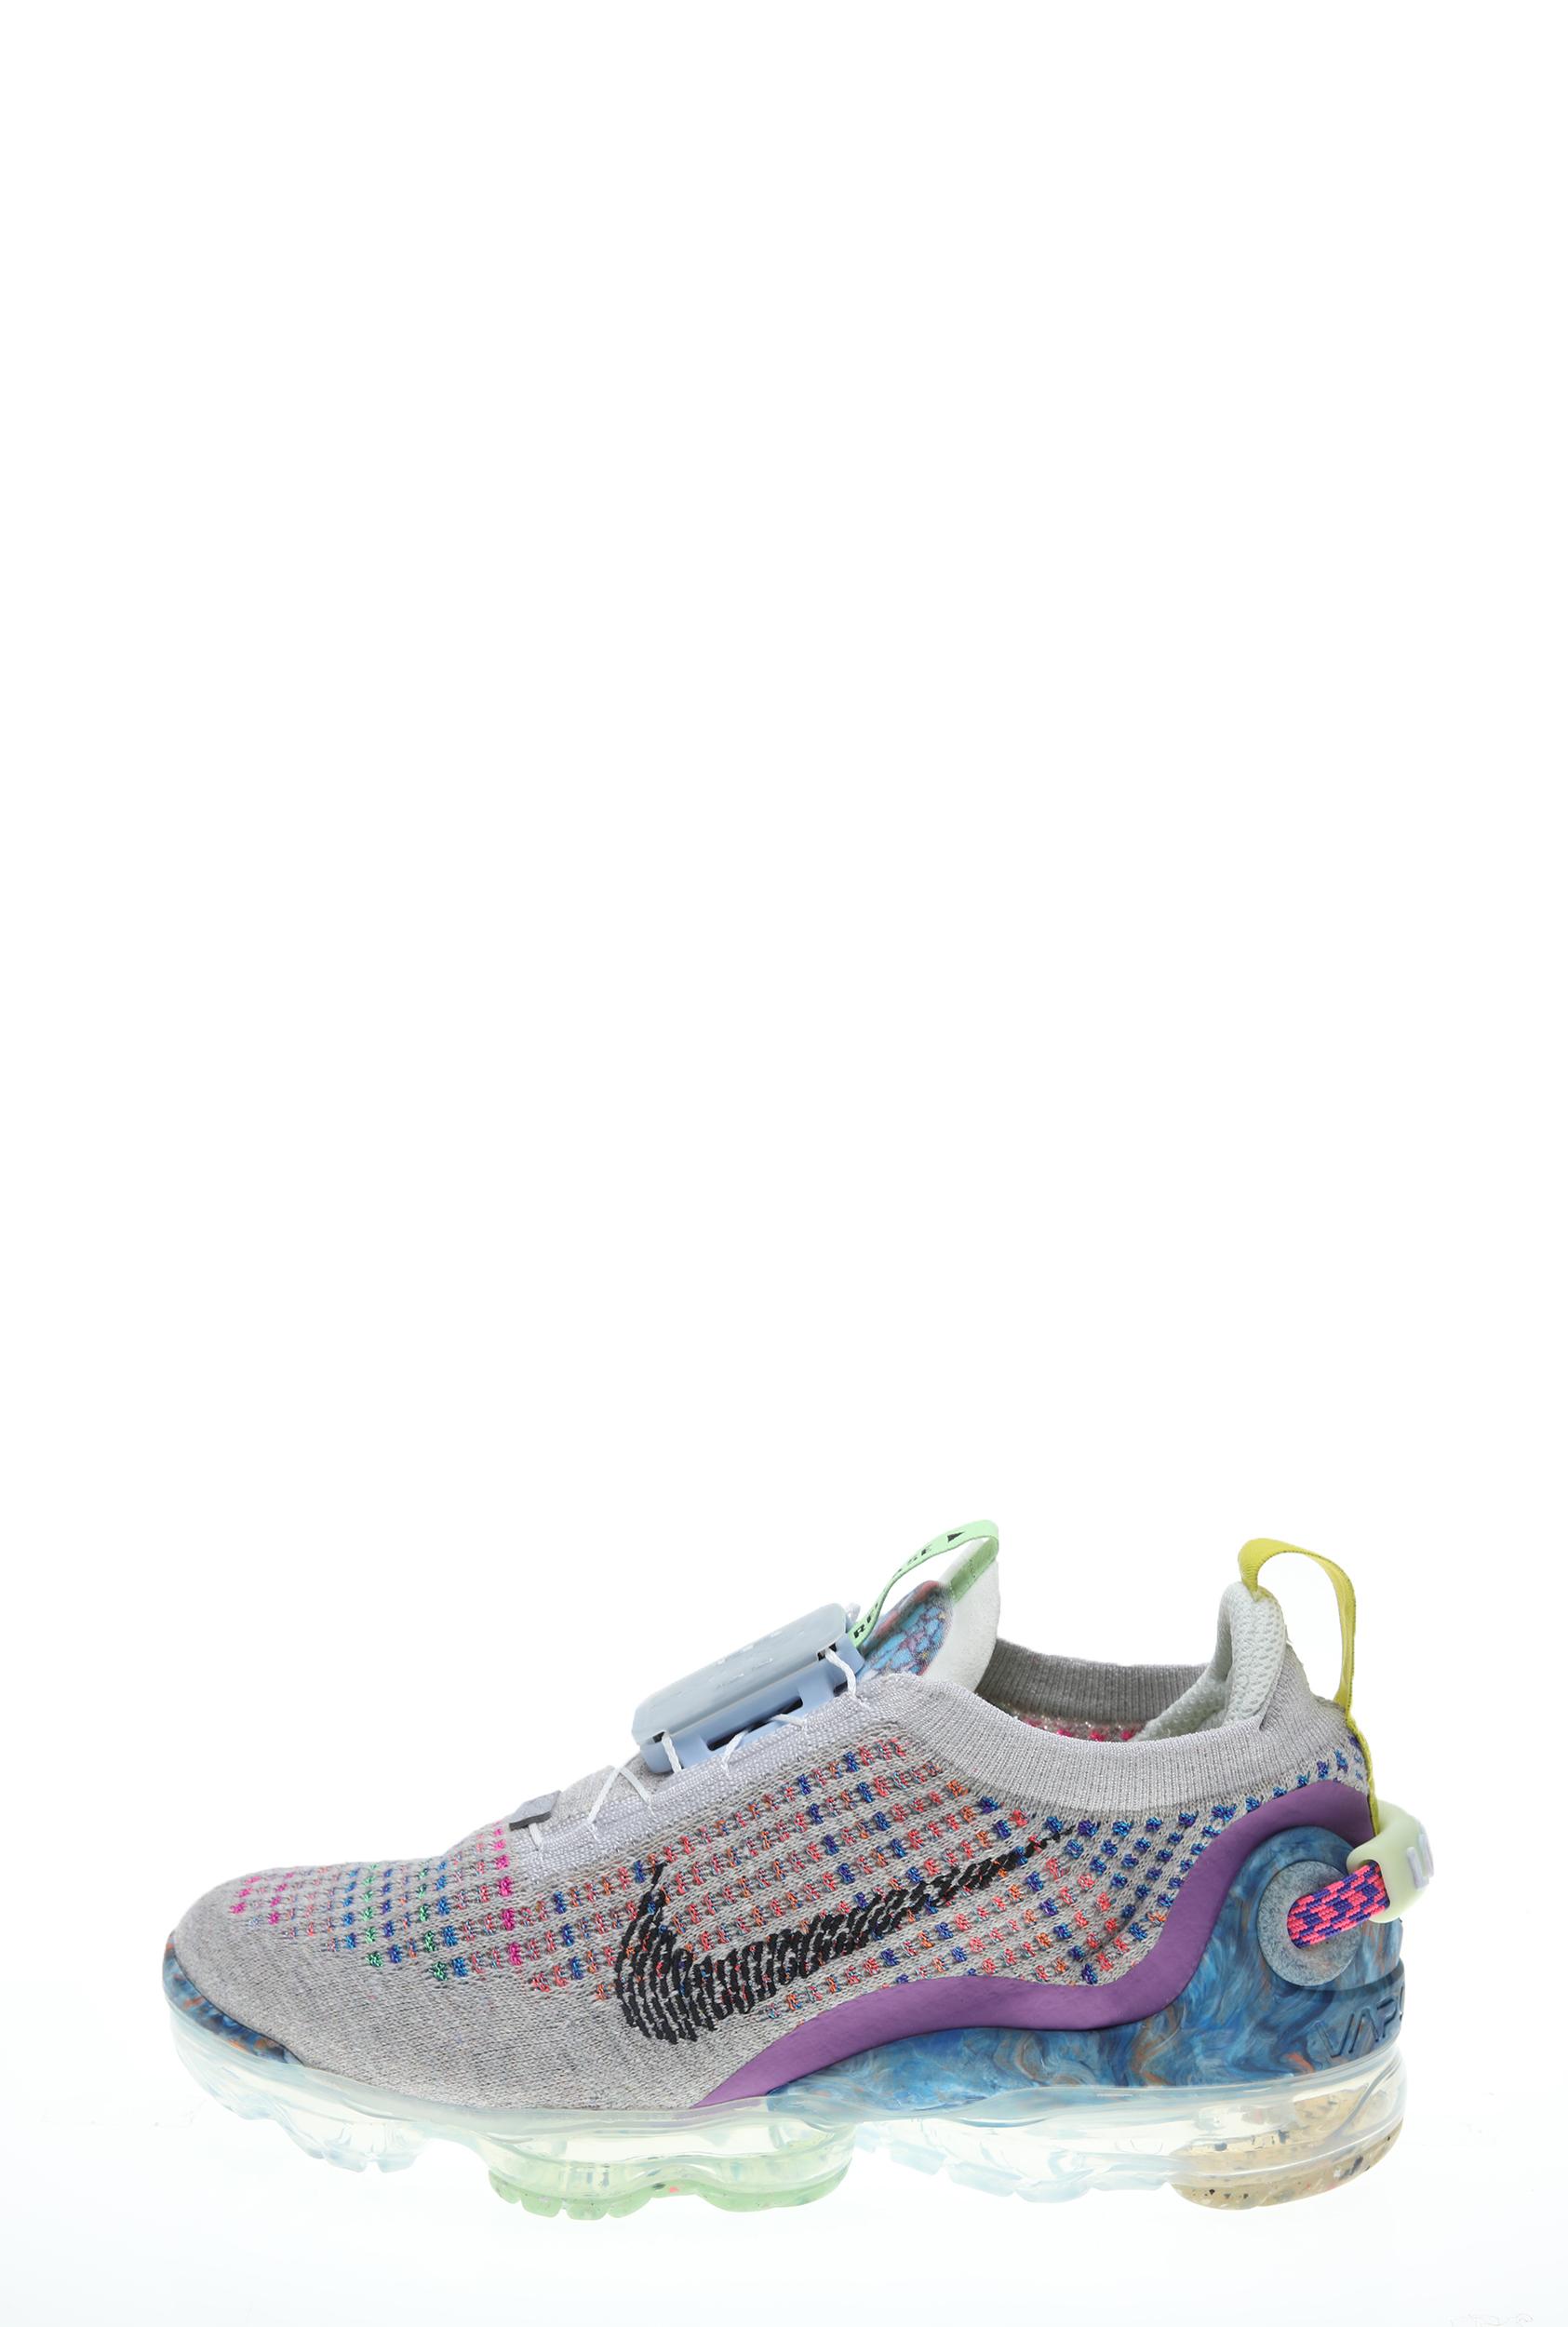 NIKE – Γυναικεία παπούτσια running NIKE AIR VAPORMAX 2020 γκρi